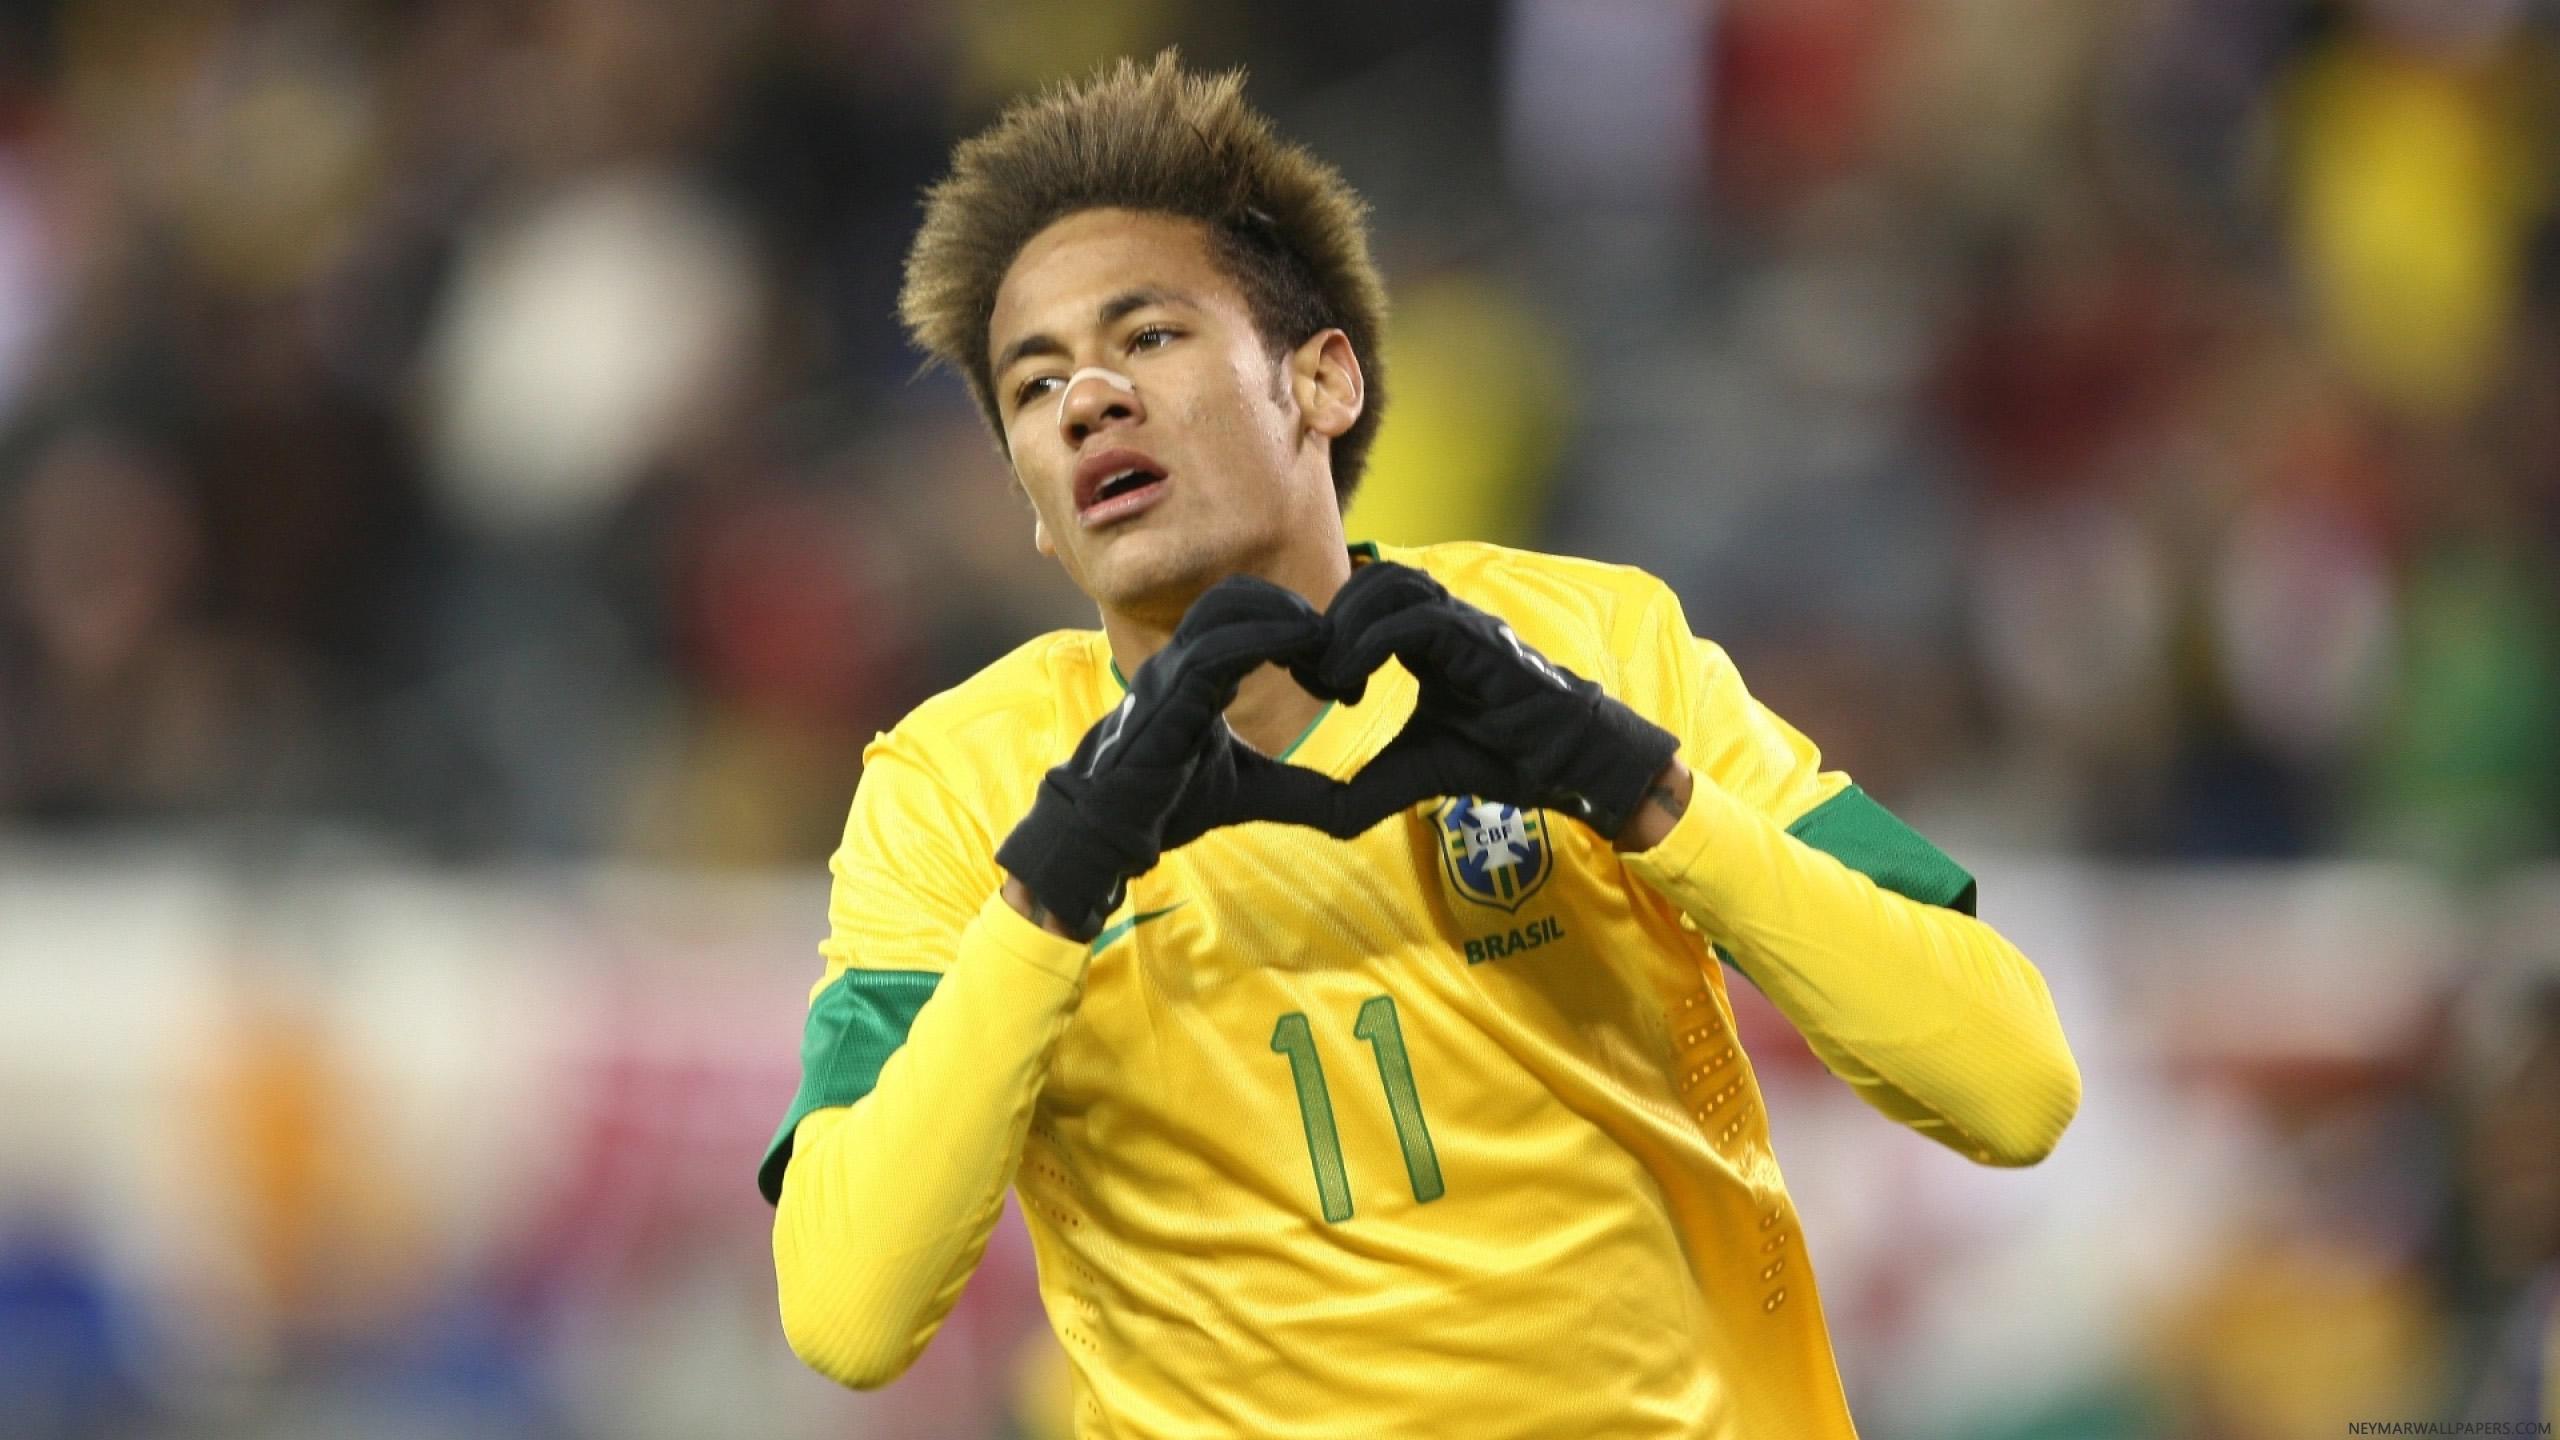 Neymar heart wallpaper